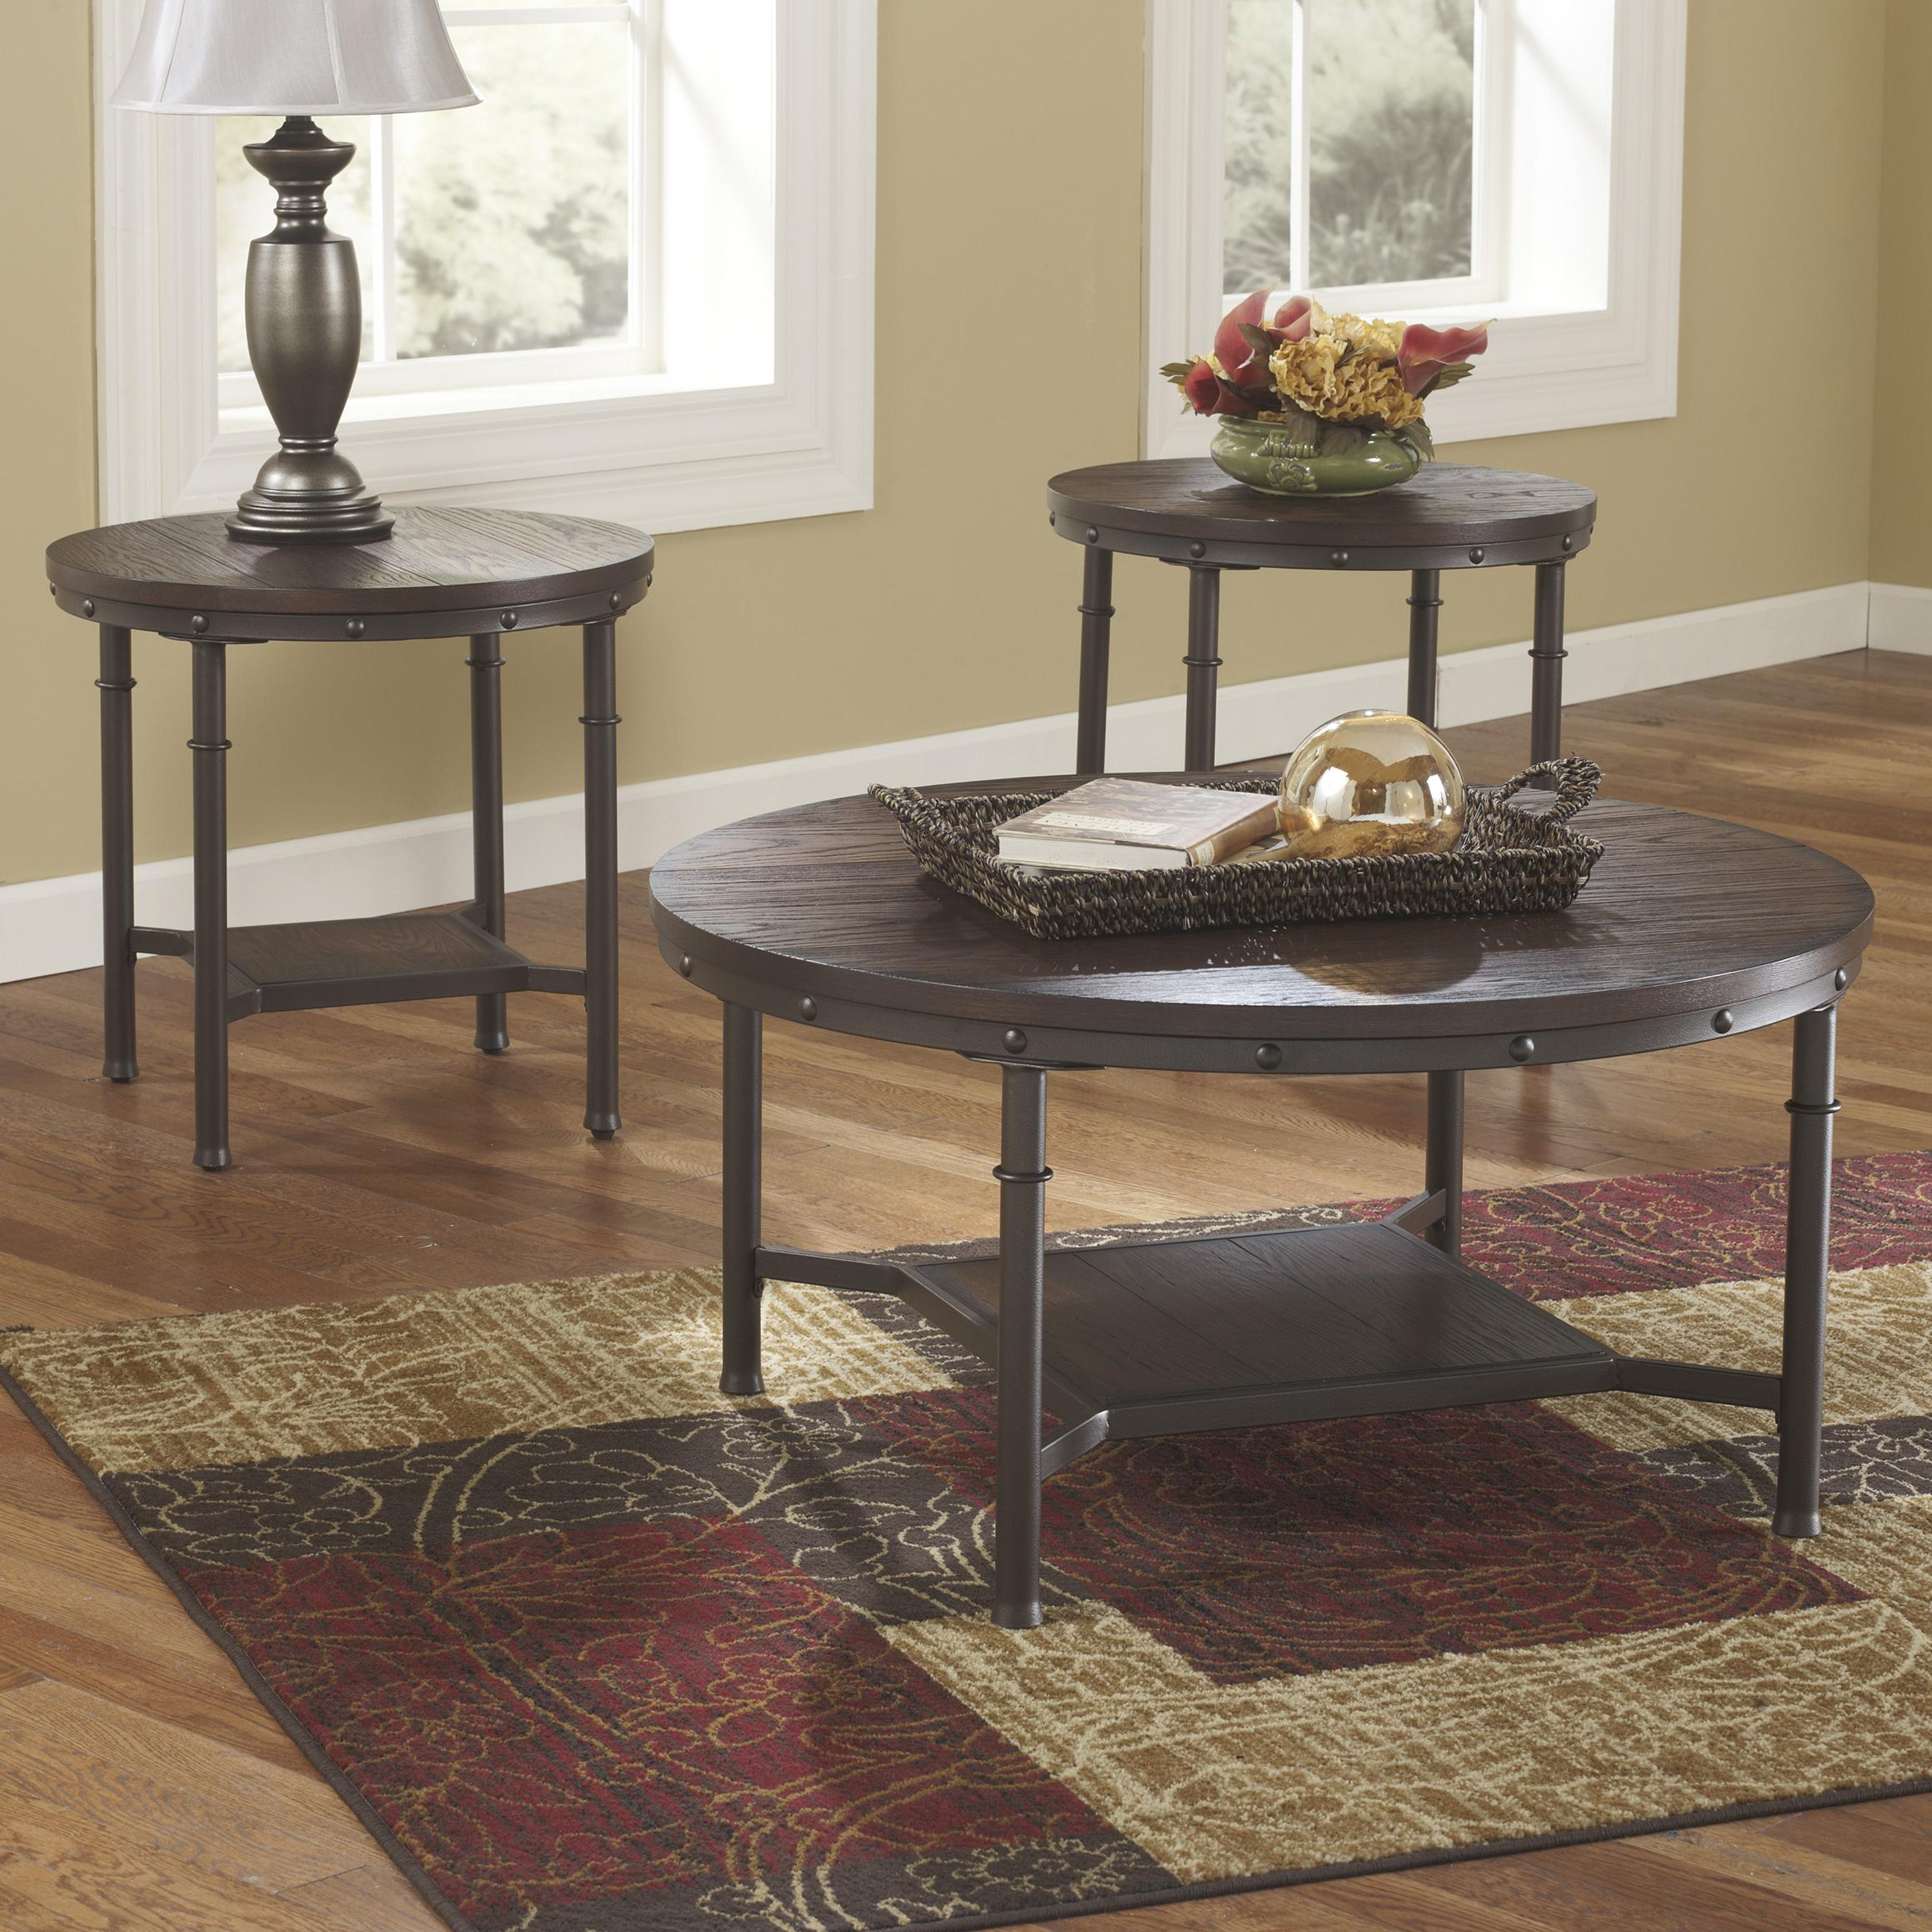 Rustic Metal and Wood Veneer Occasional Table Set